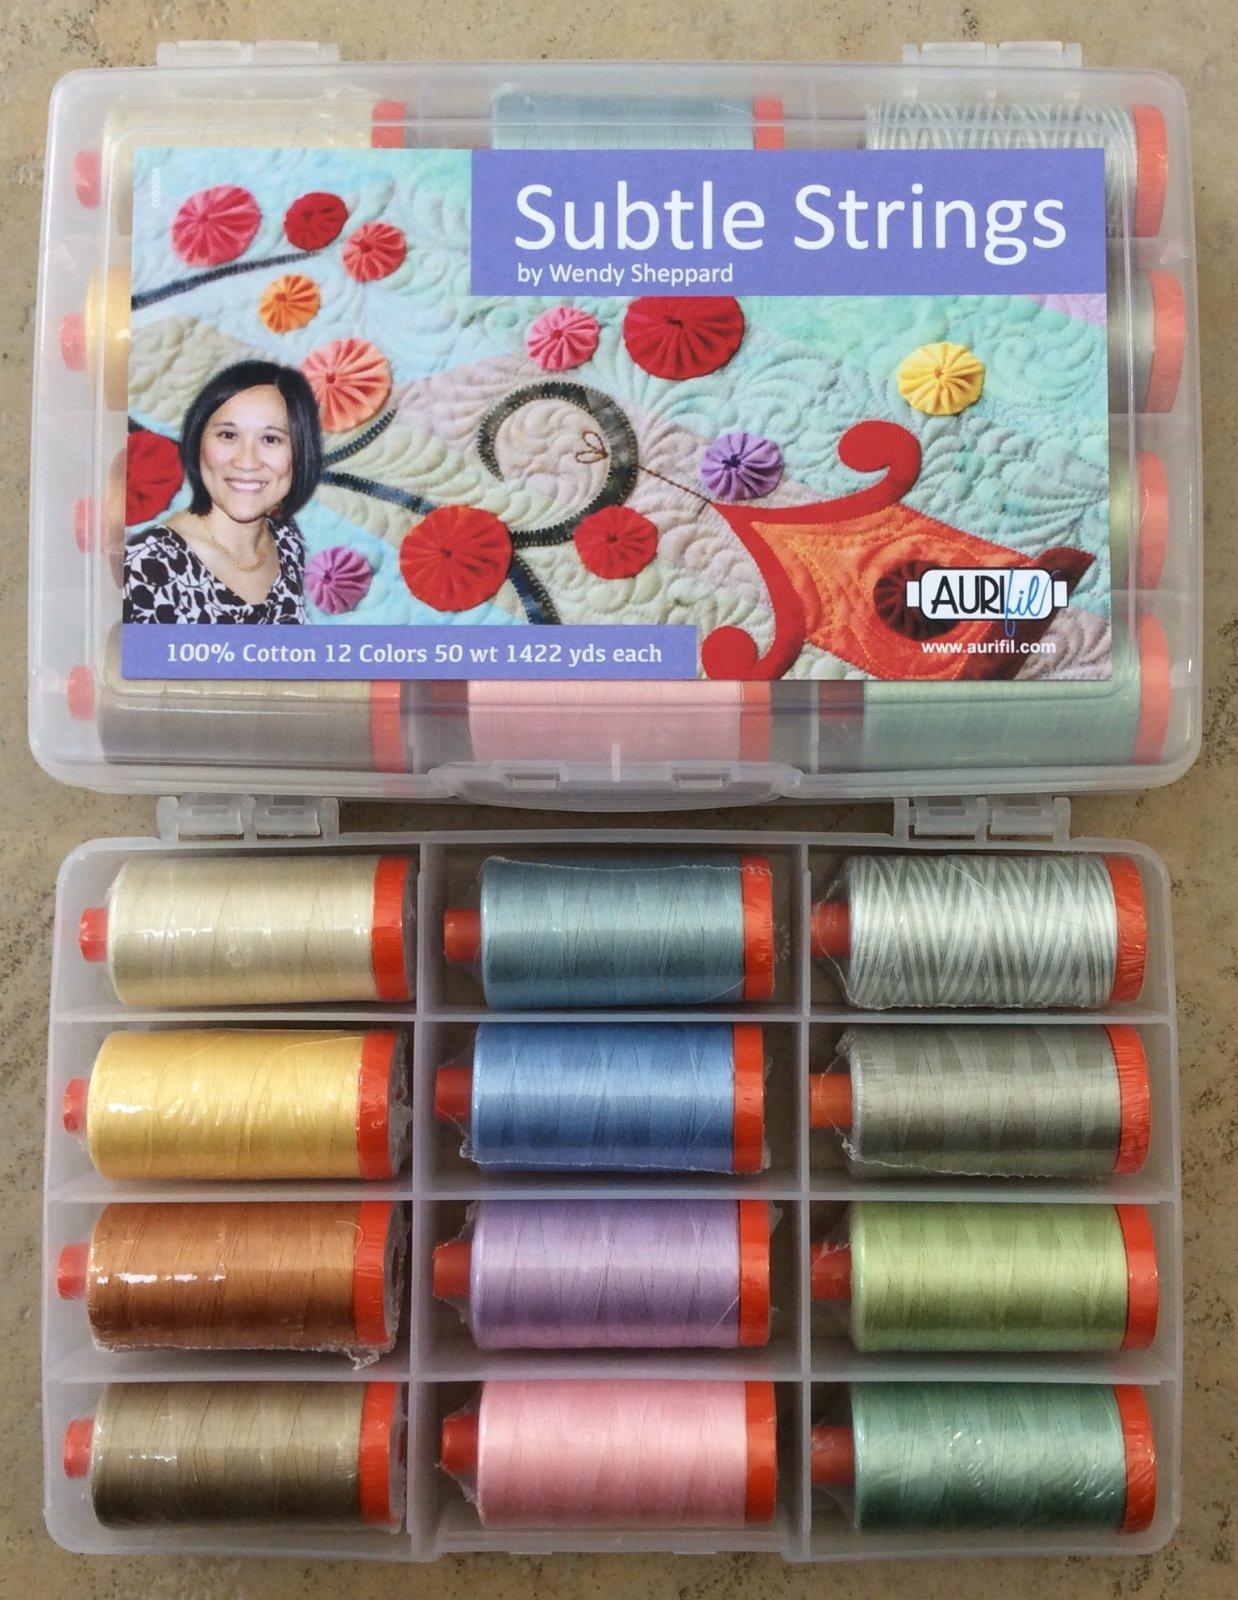 Wendy Sheppard's Subtle Strings